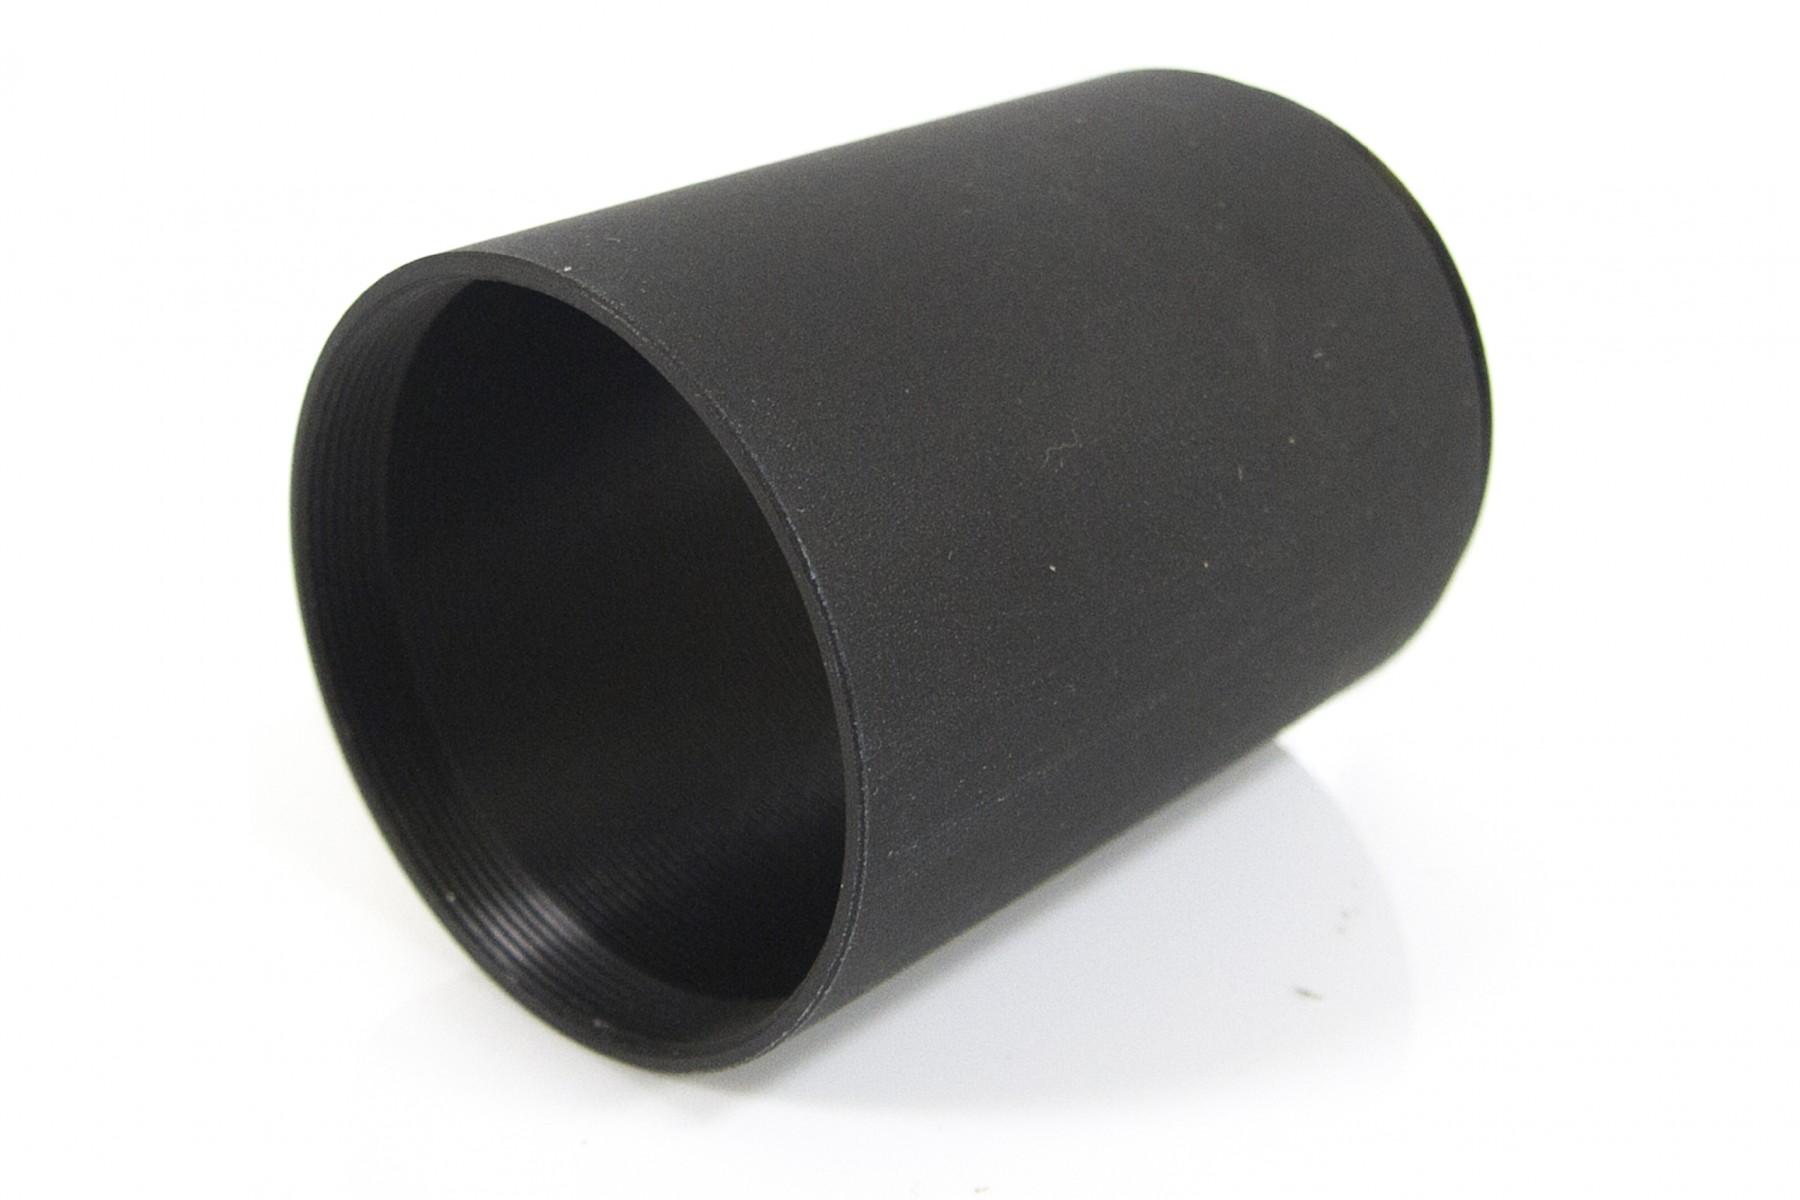 NUPROL 32MM SUNSHADE product image